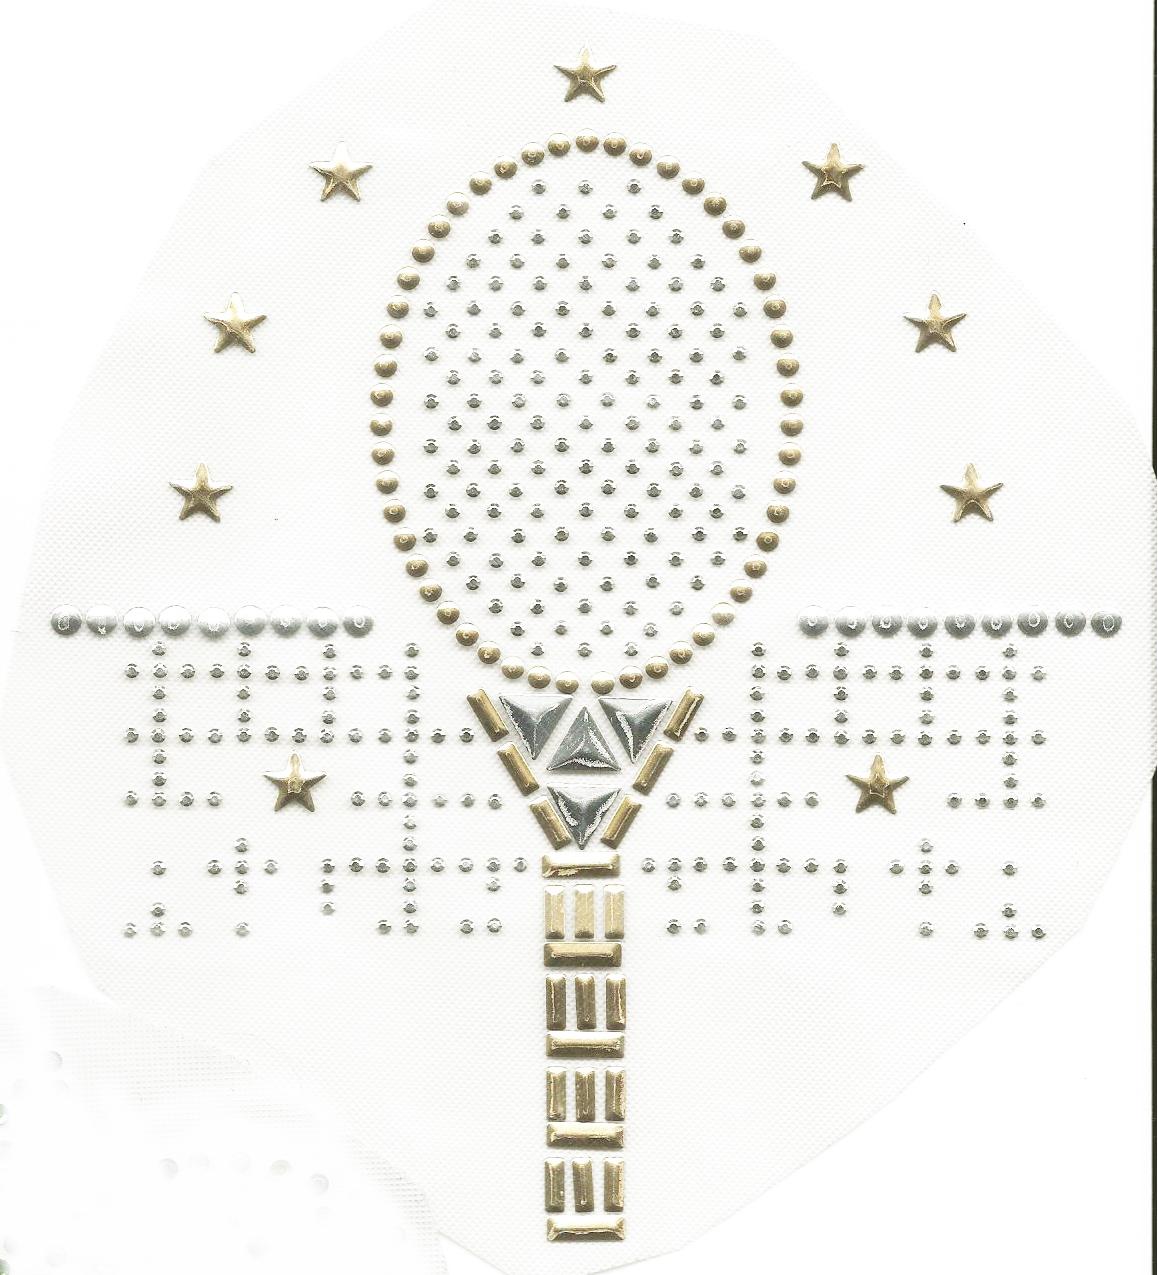 Rhinestud Applique - Tennis Racket